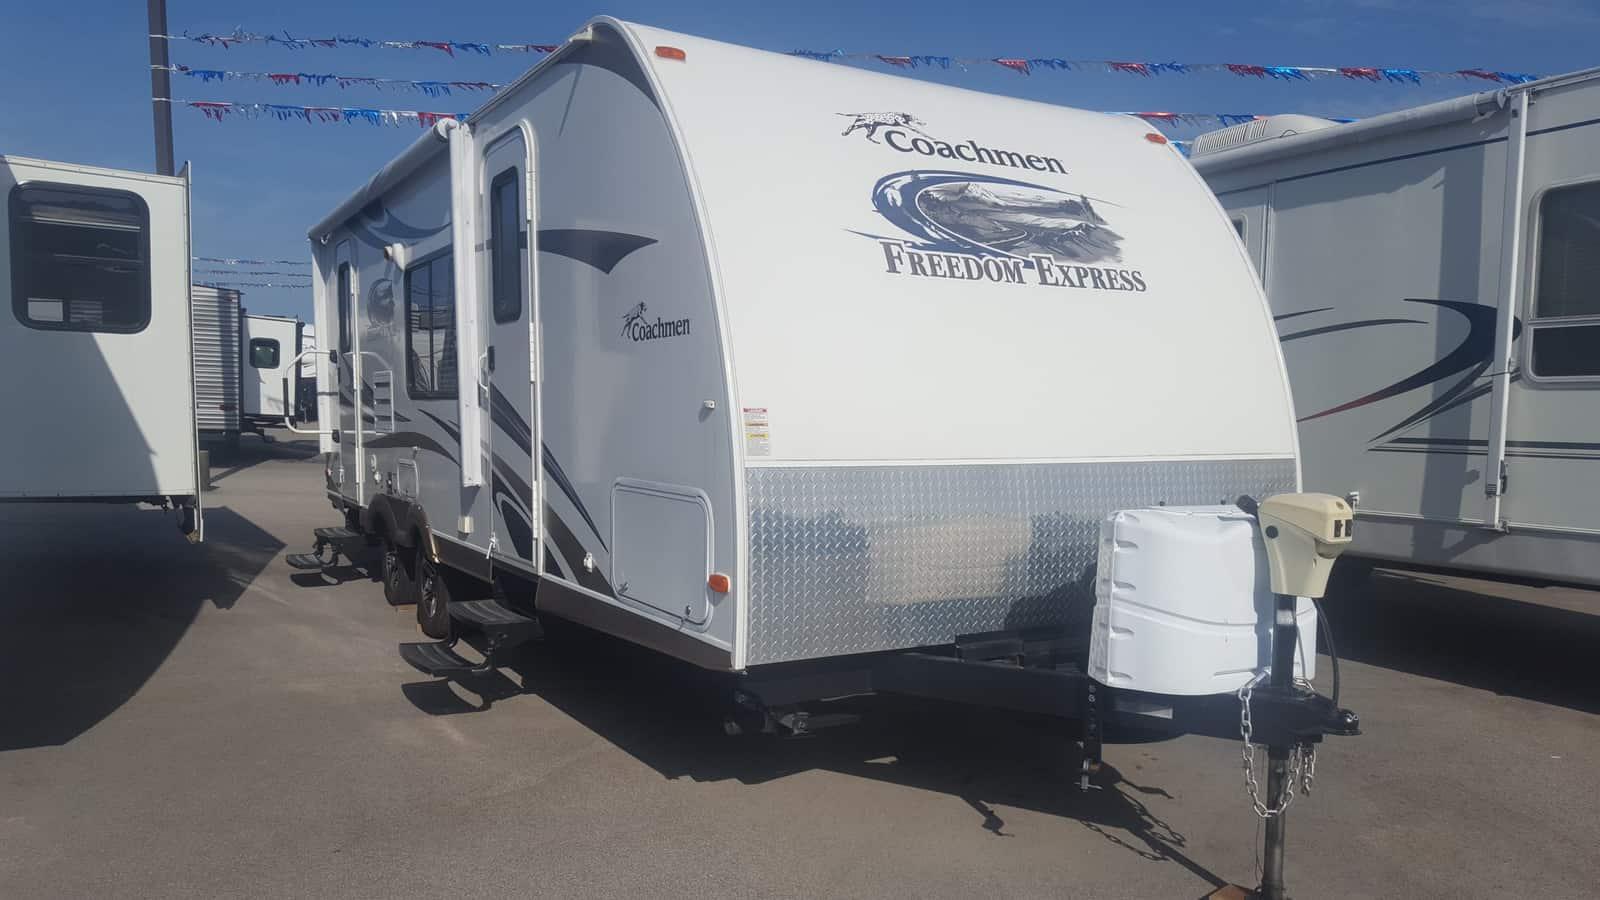 USED 2013 Coachmen FREEDOM EXPRESS 242RBS - American RV